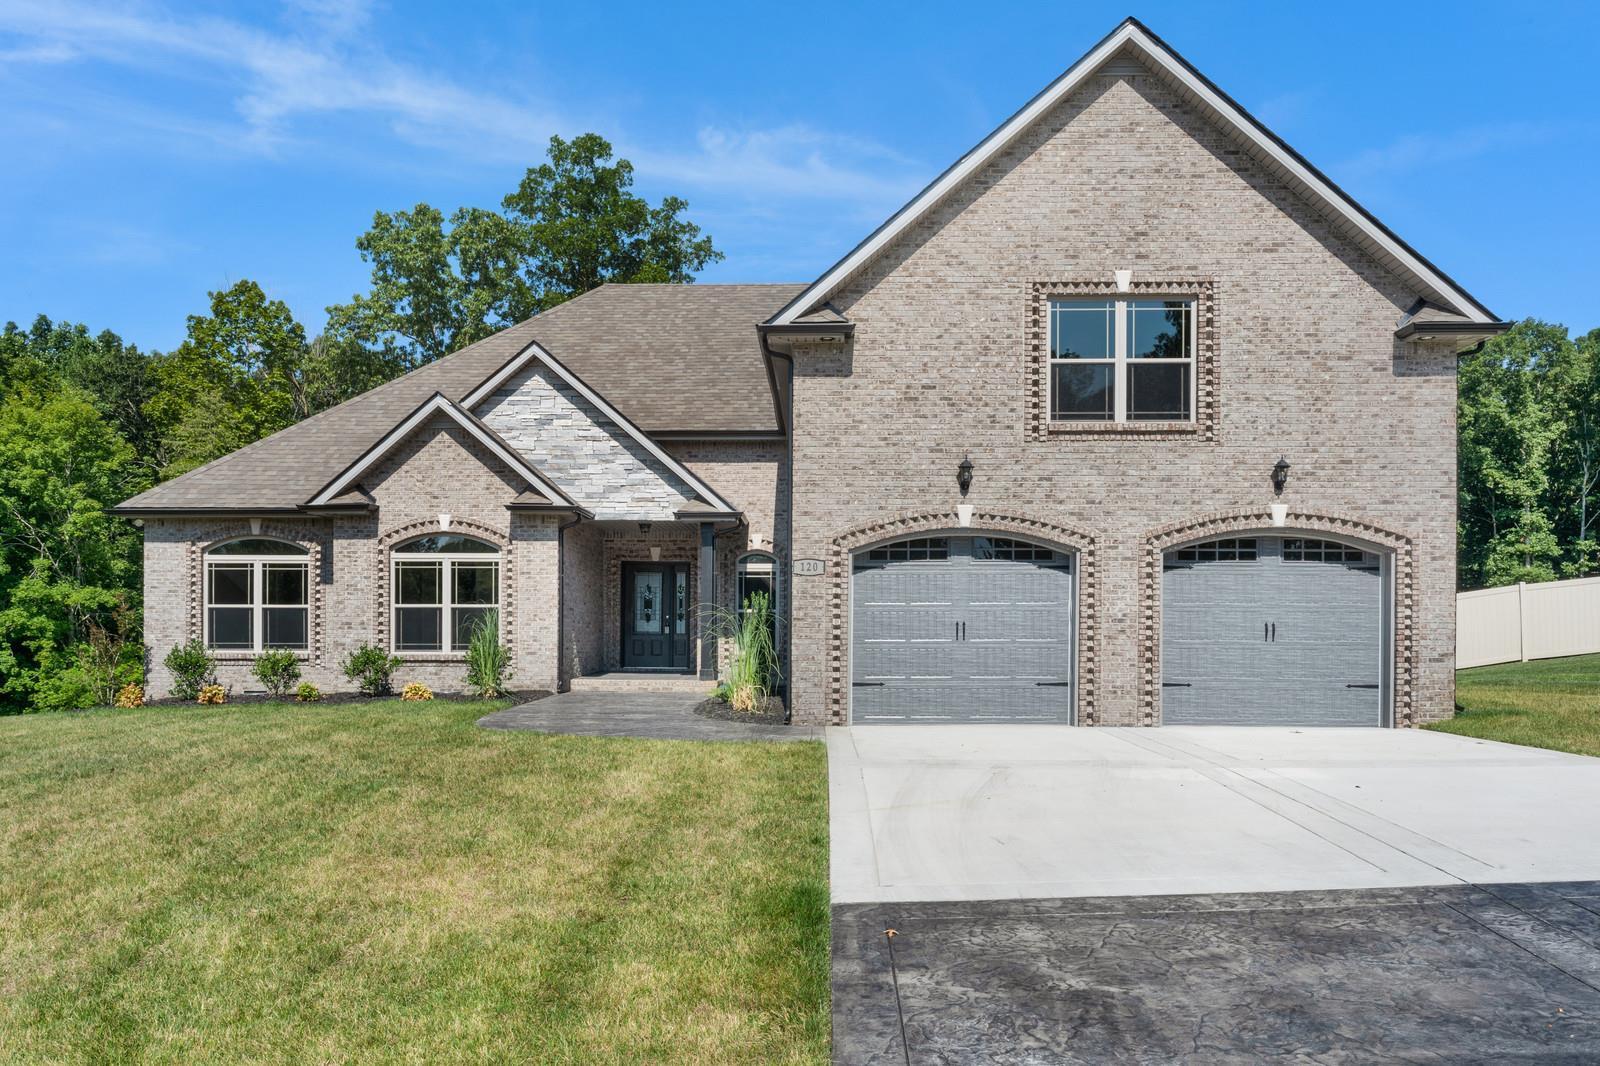 120 Takao Ct, Clarksville, TN 37042 - Clarksville, TN real estate listing